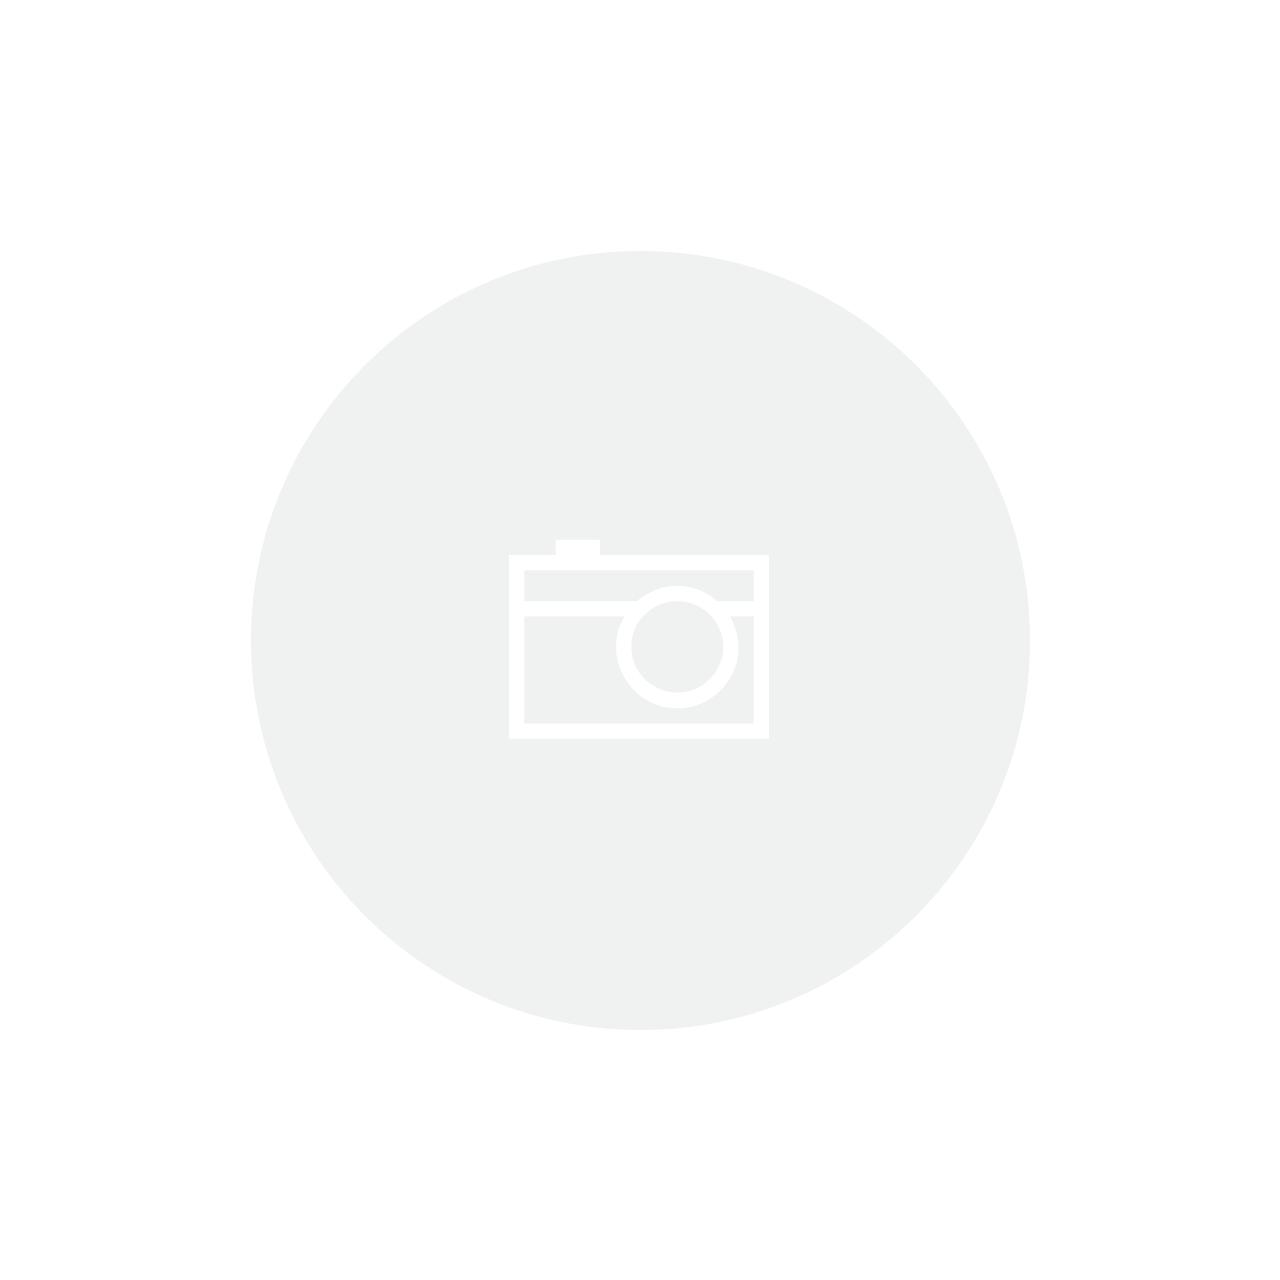 Caçarola Funda Inox Ø28Cm Professional Tramontina